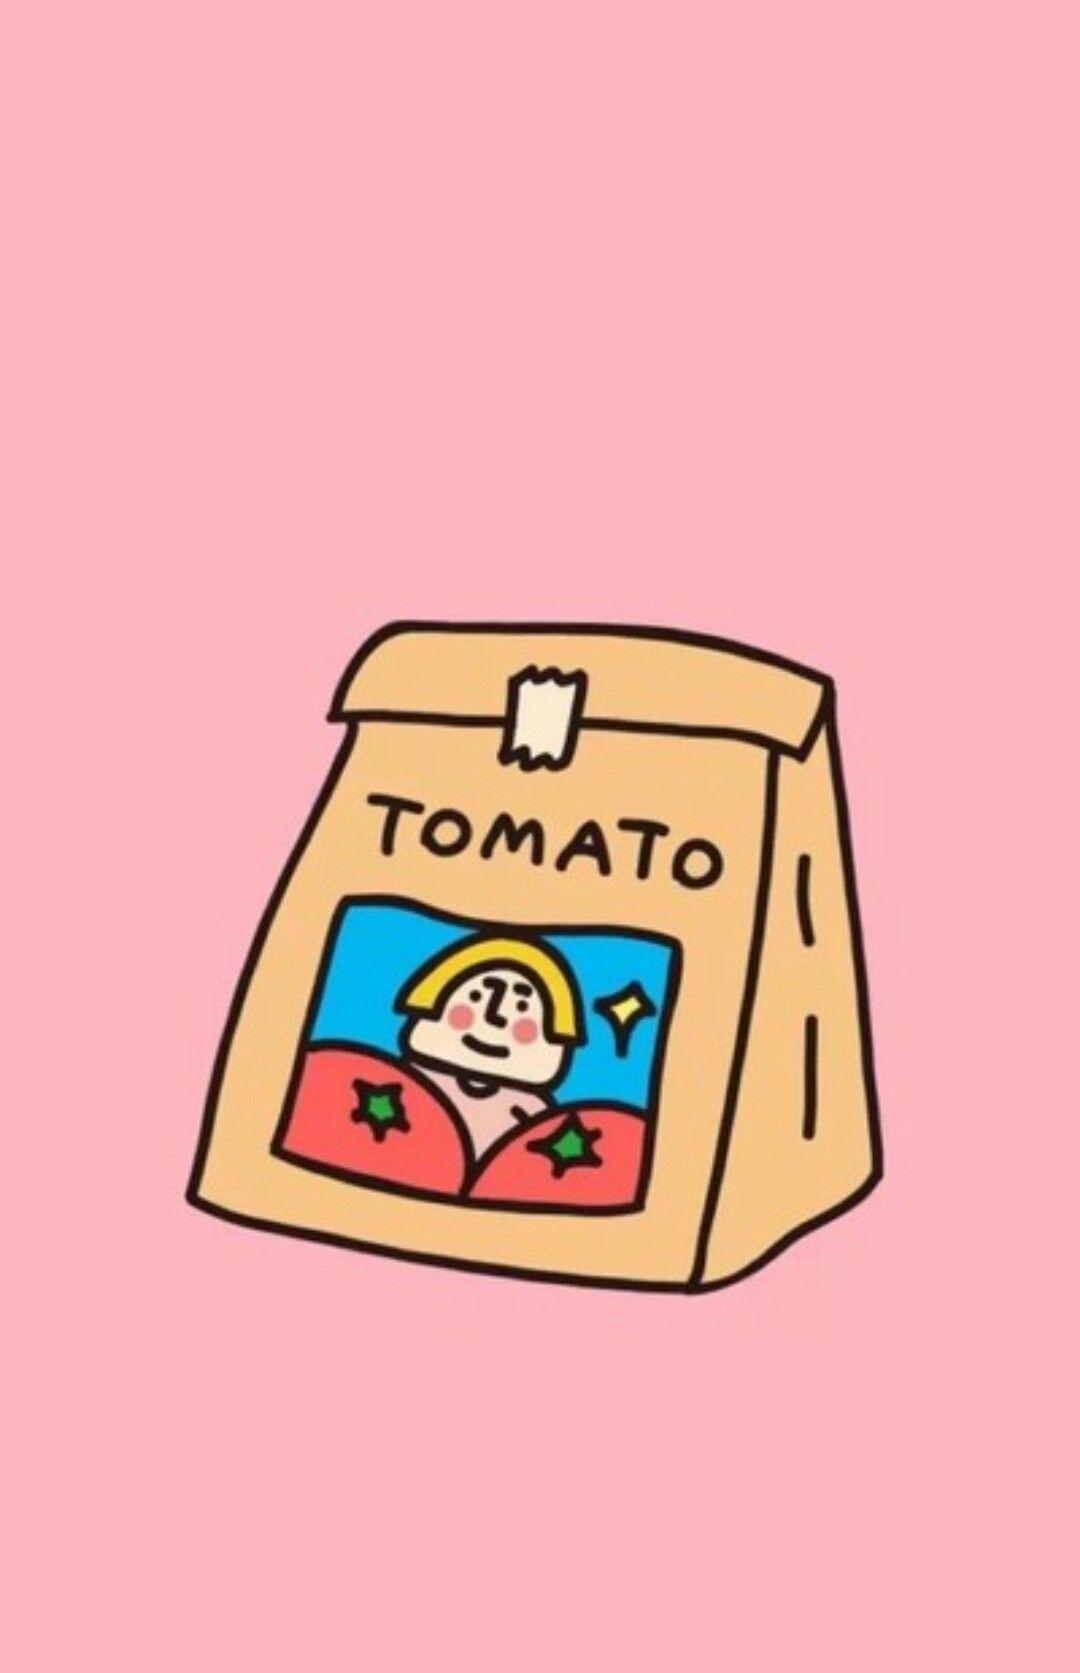 Tomato Bag Wallpaper